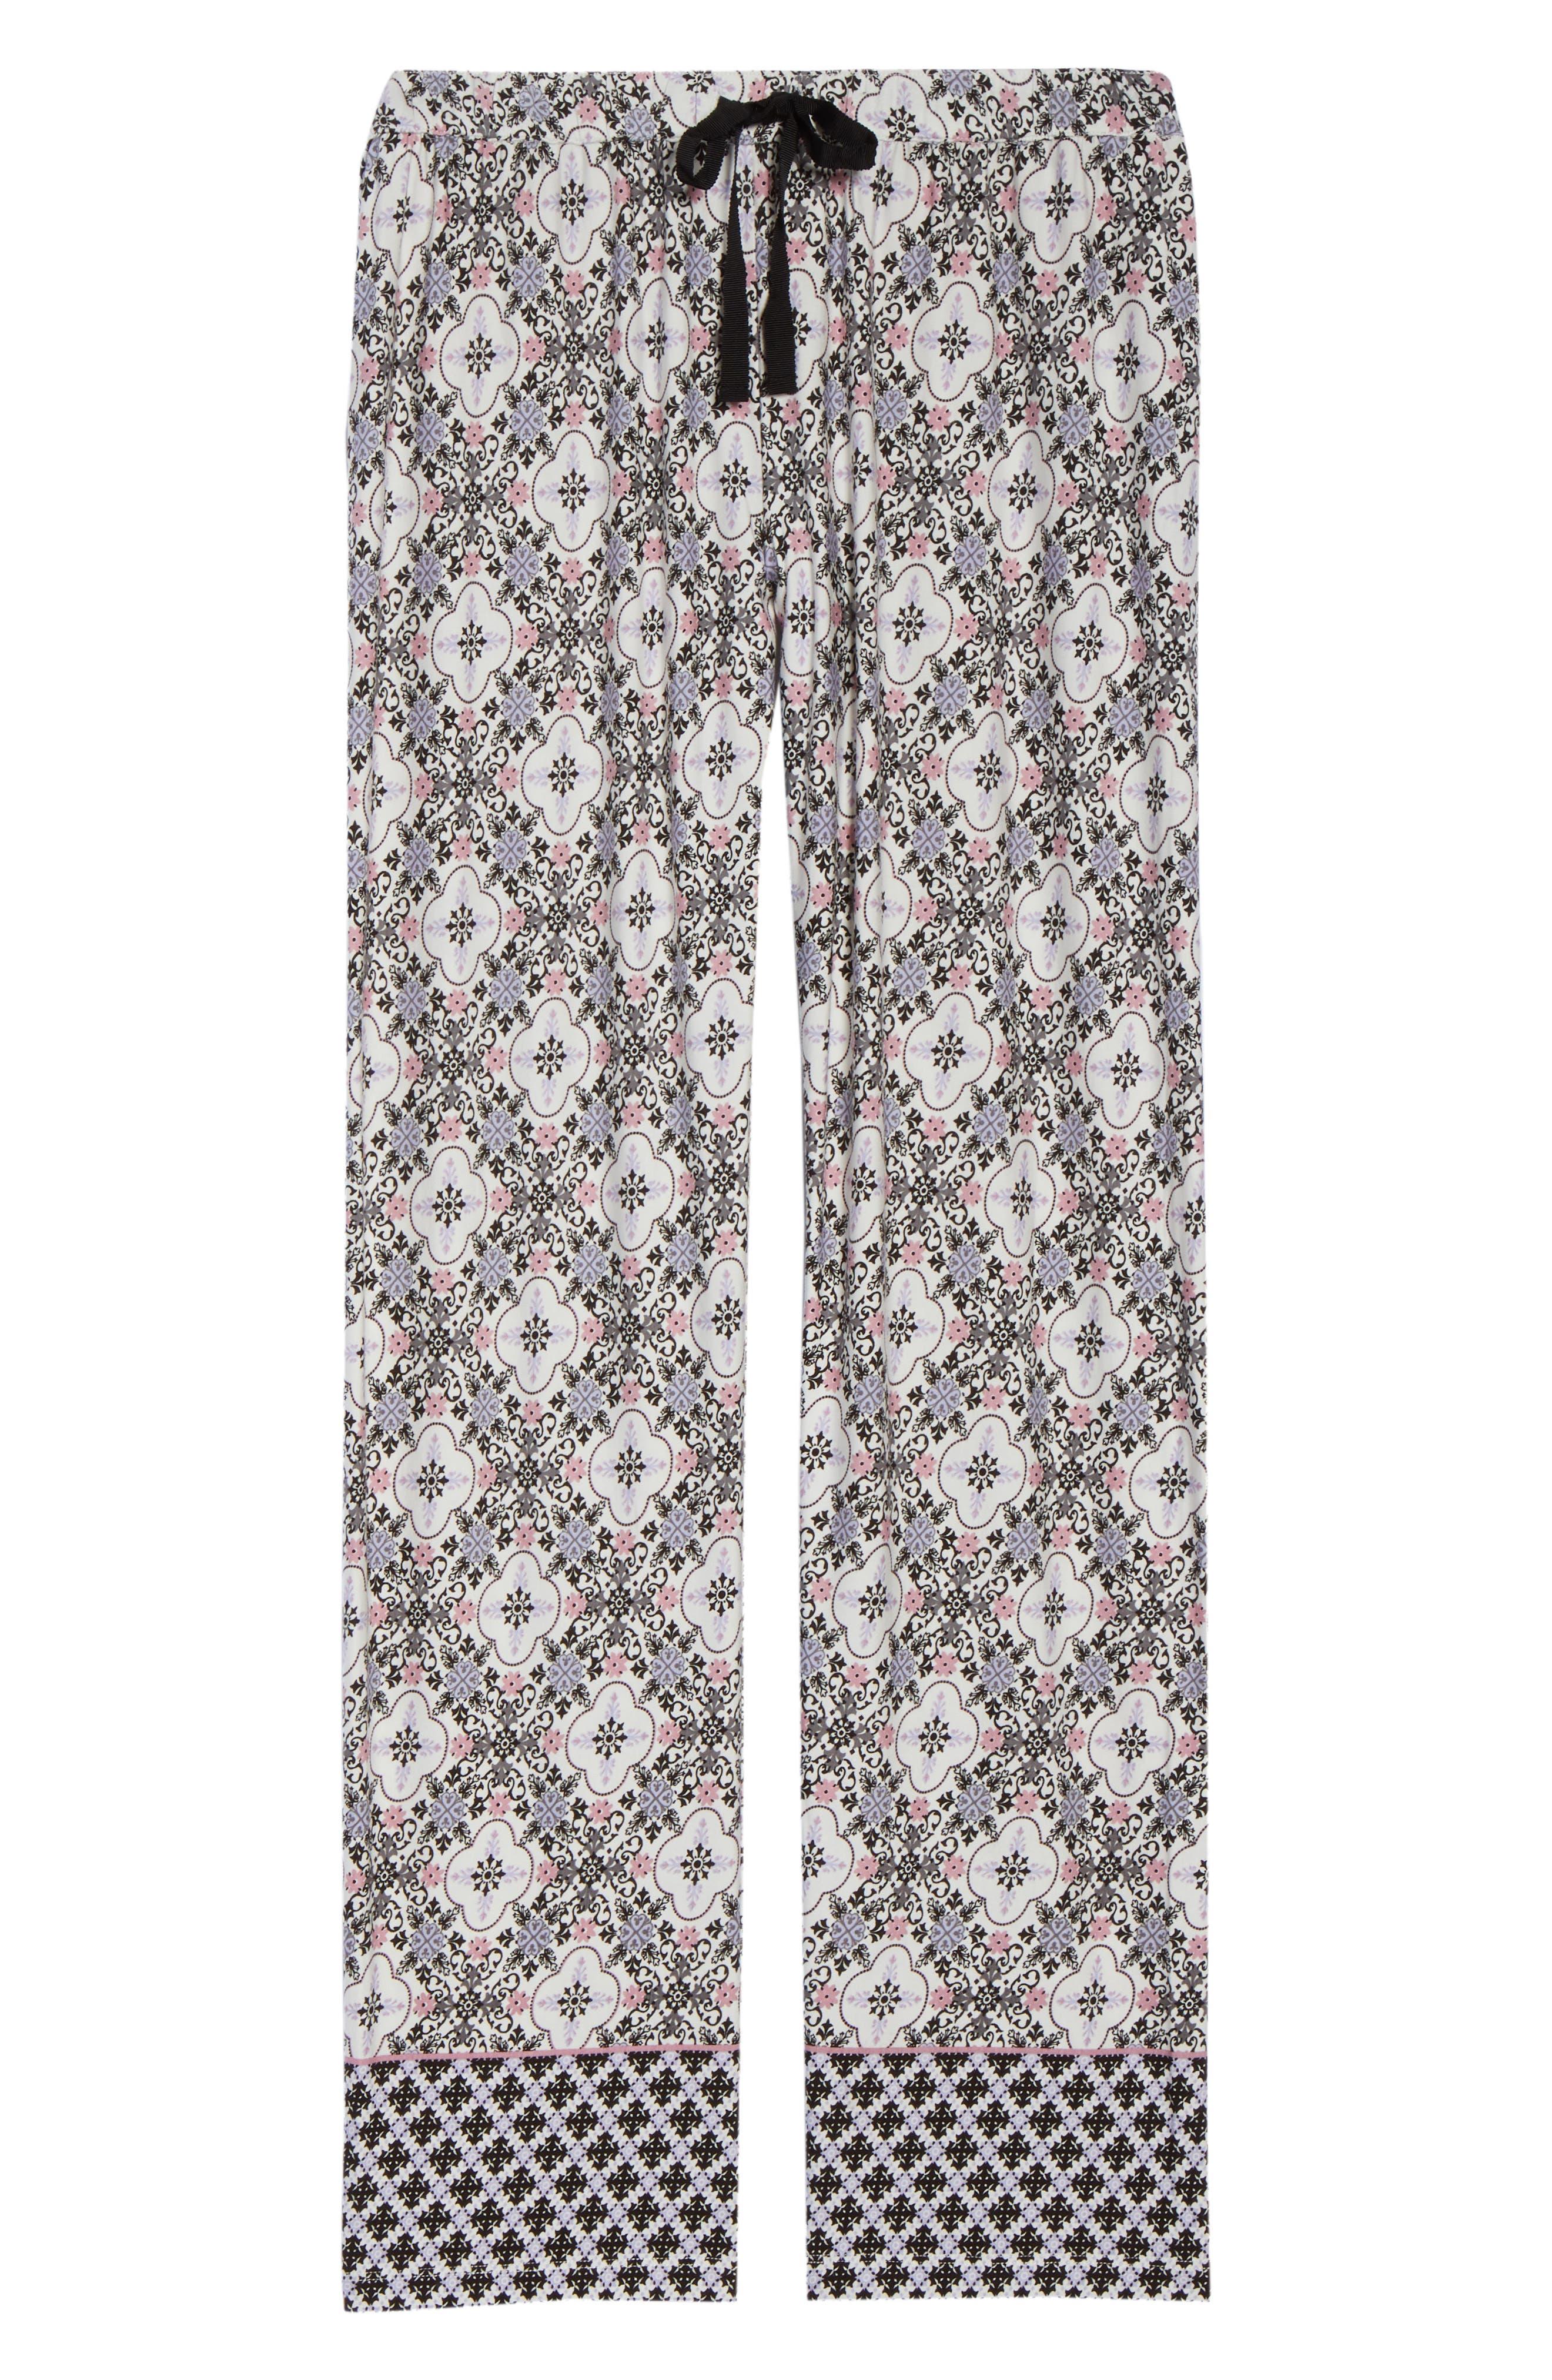 Ankle Pajama Pants,                             Alternate thumbnail 6, color,                             901